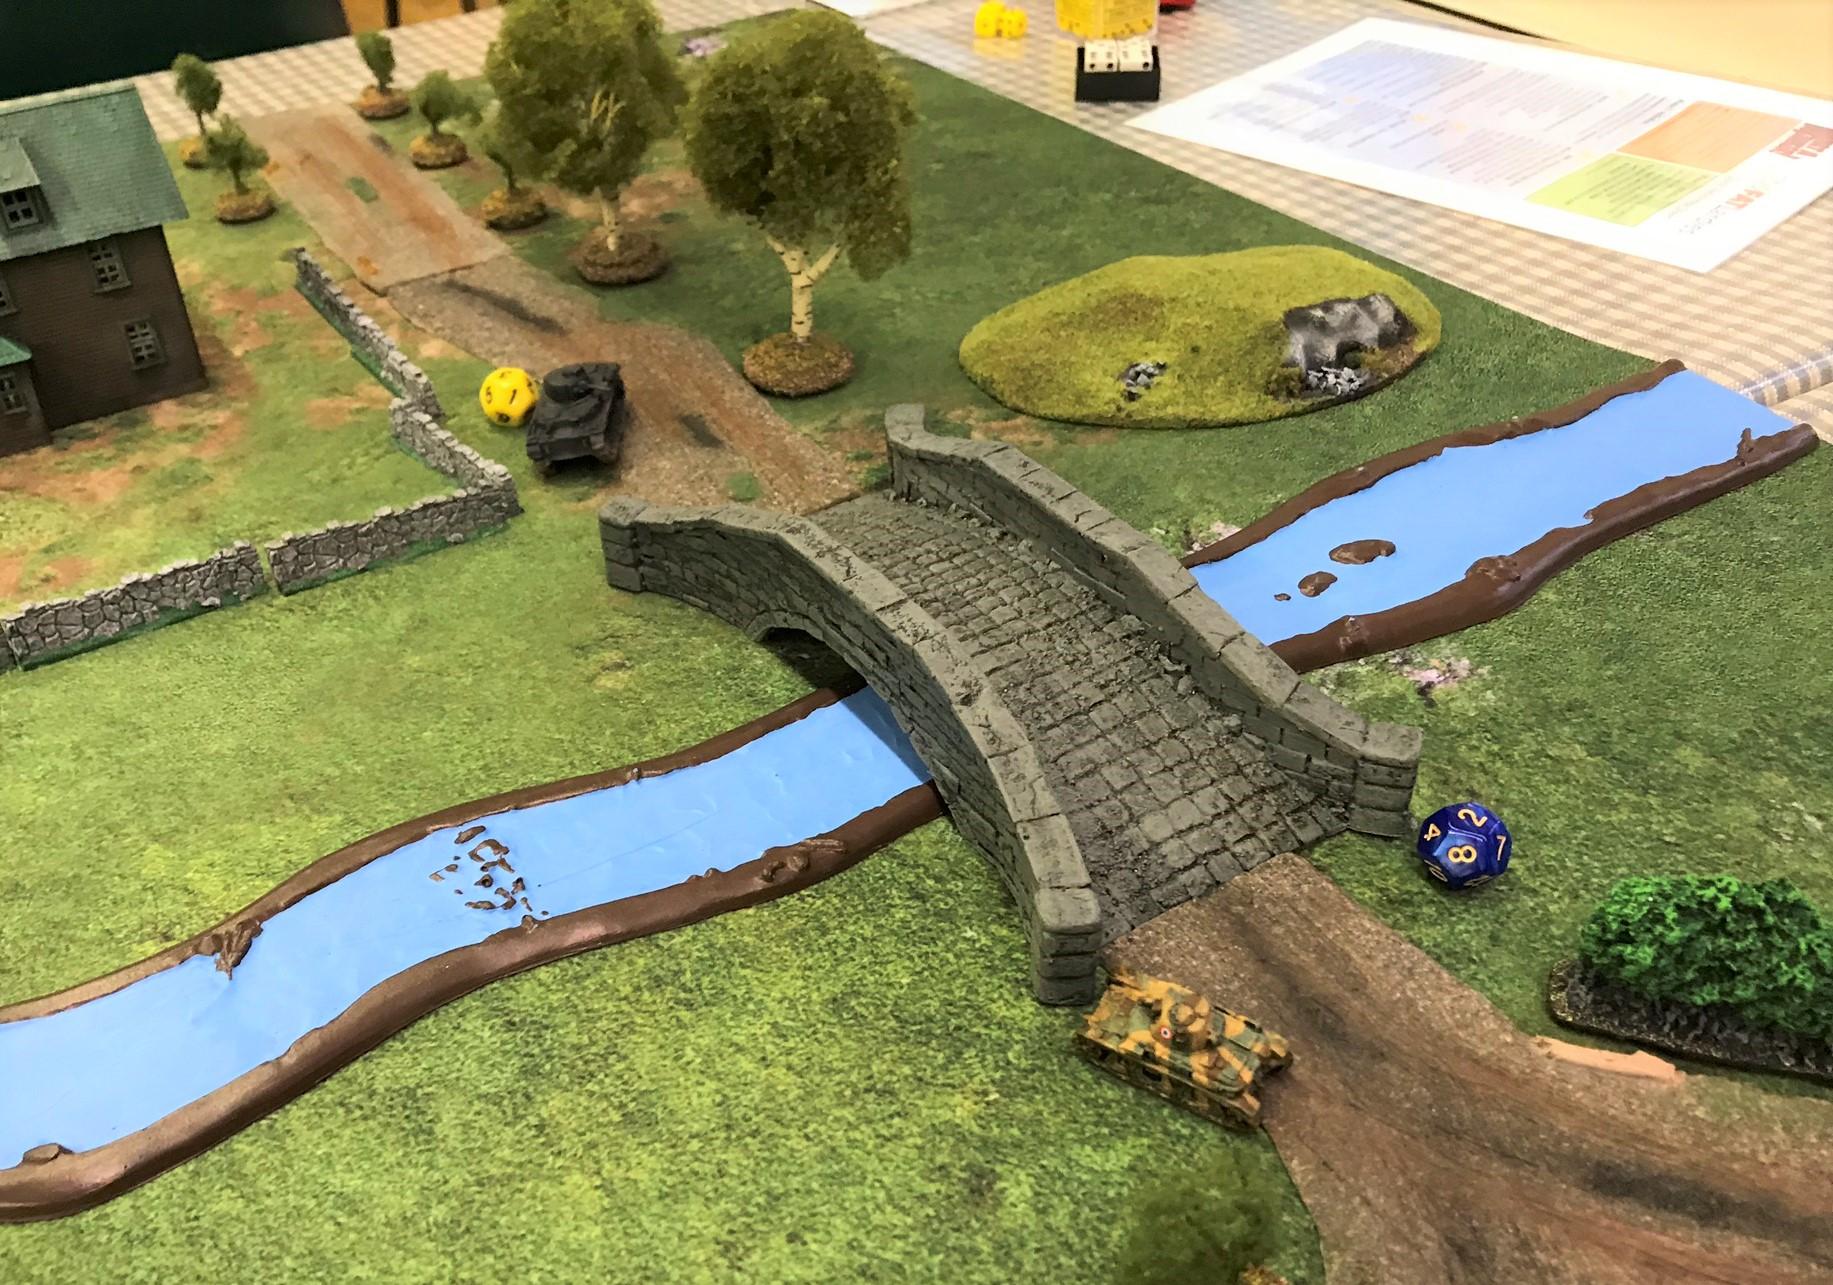 4 r35 maneuvers against pz ivd